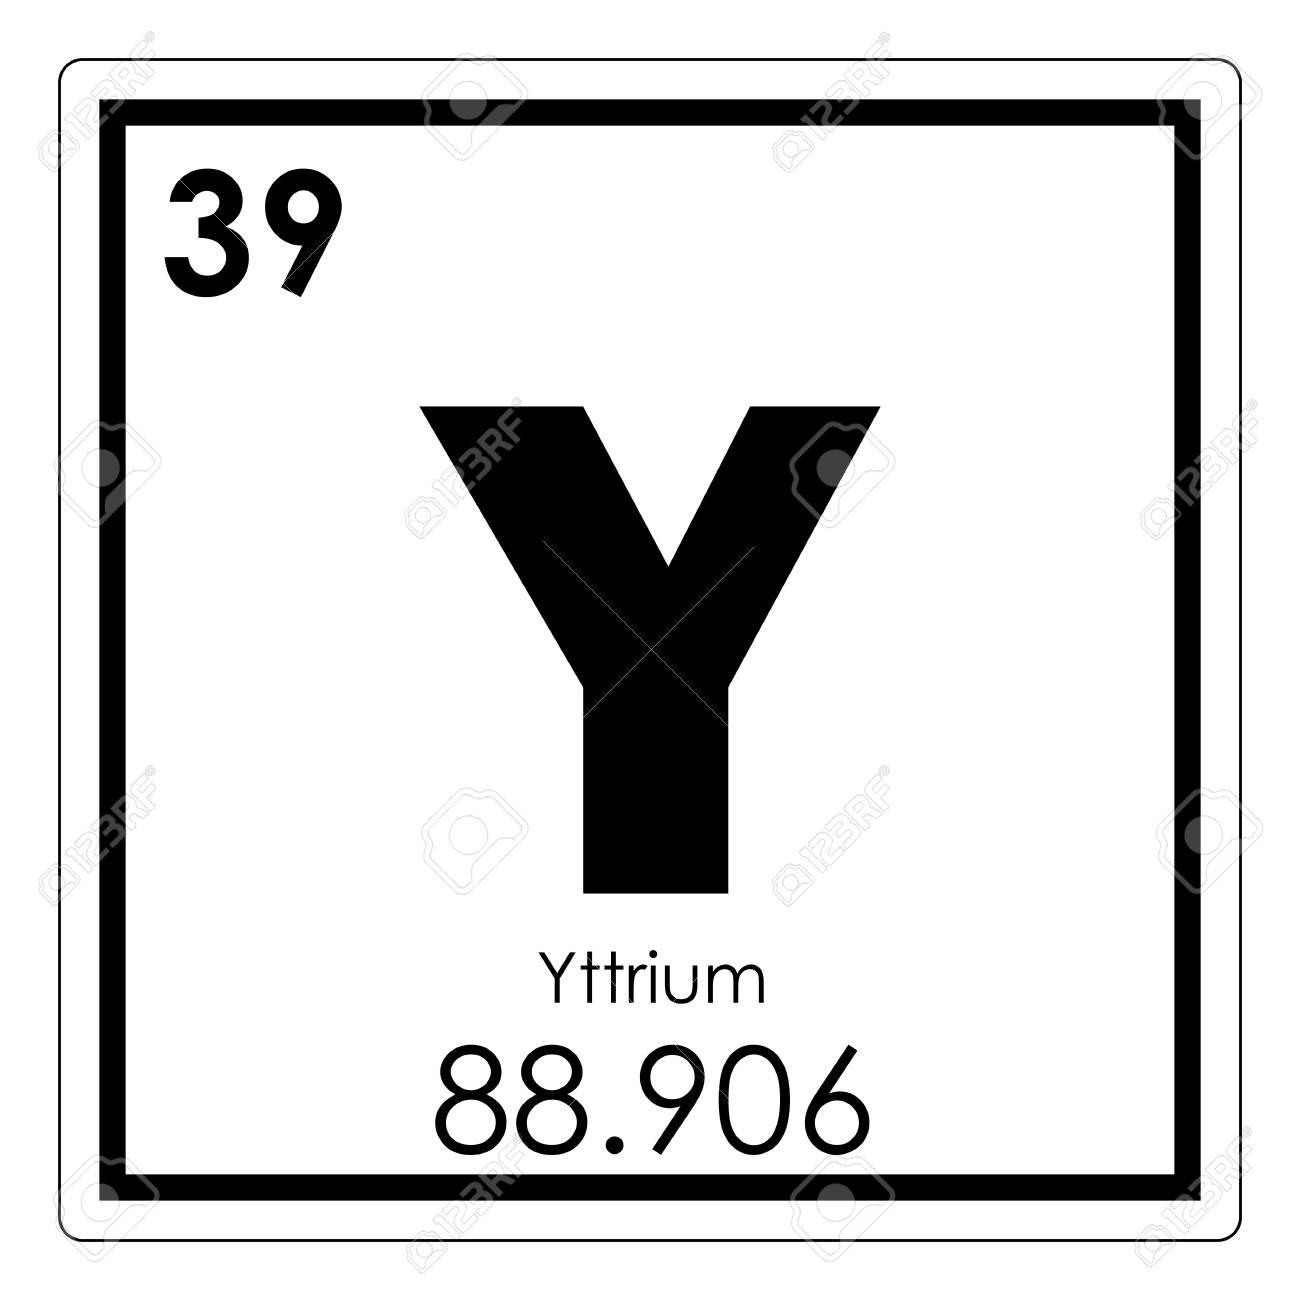 Yttrium chemical element periodic table science symbol stock photo stock photo yttrium chemical element periodic table science symbol urtaz Choice Image